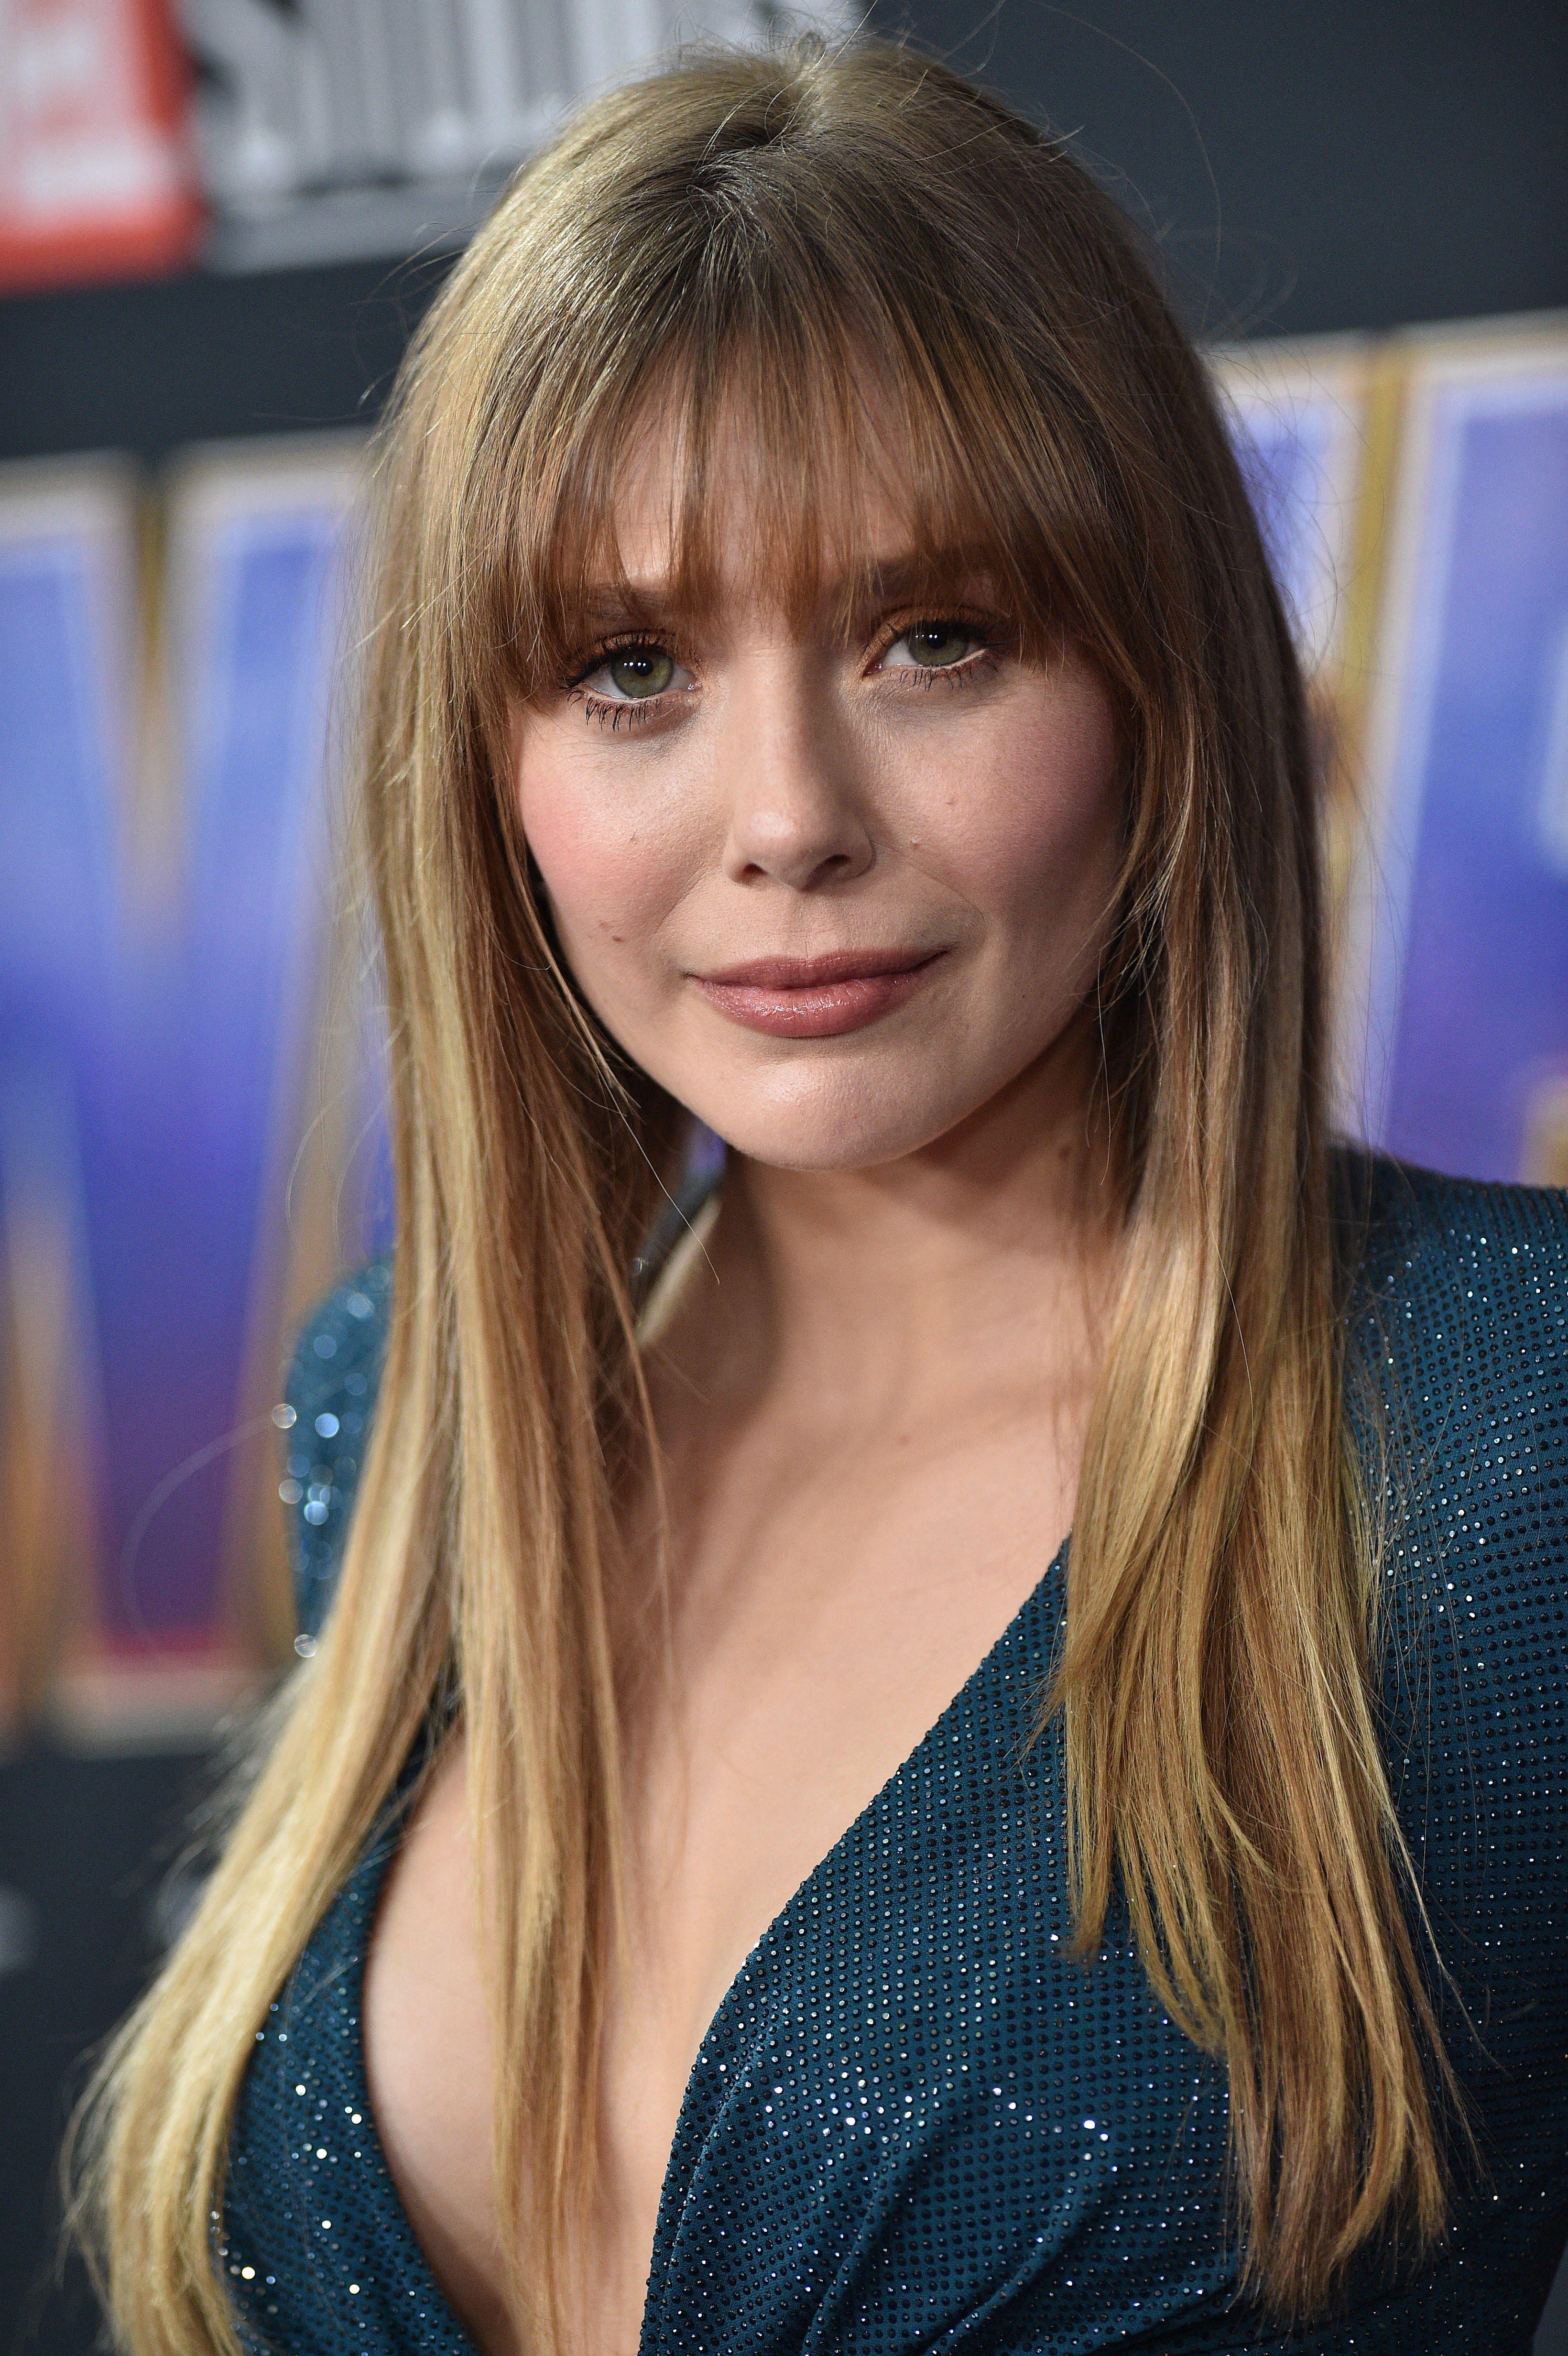 Elizabeth Olsen April 22 Avengers Endgame World Premiere In Los Angeles Actrices Bonitas Actrices Celebridades